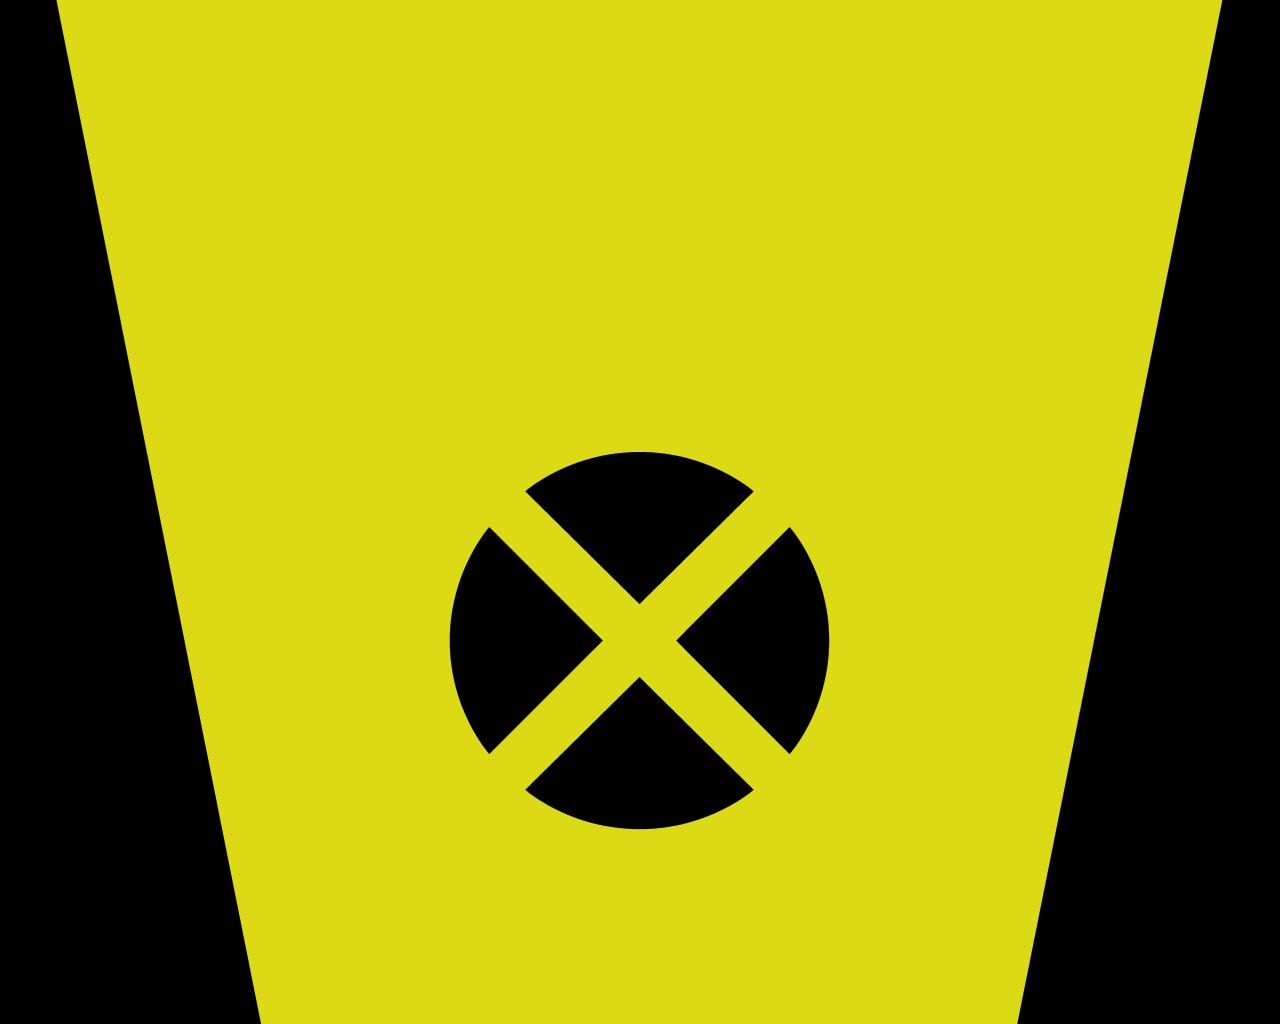 Wallpaper iphone 6 xman - Men Logo Wallpaper For Iphone X Men Logo Wal